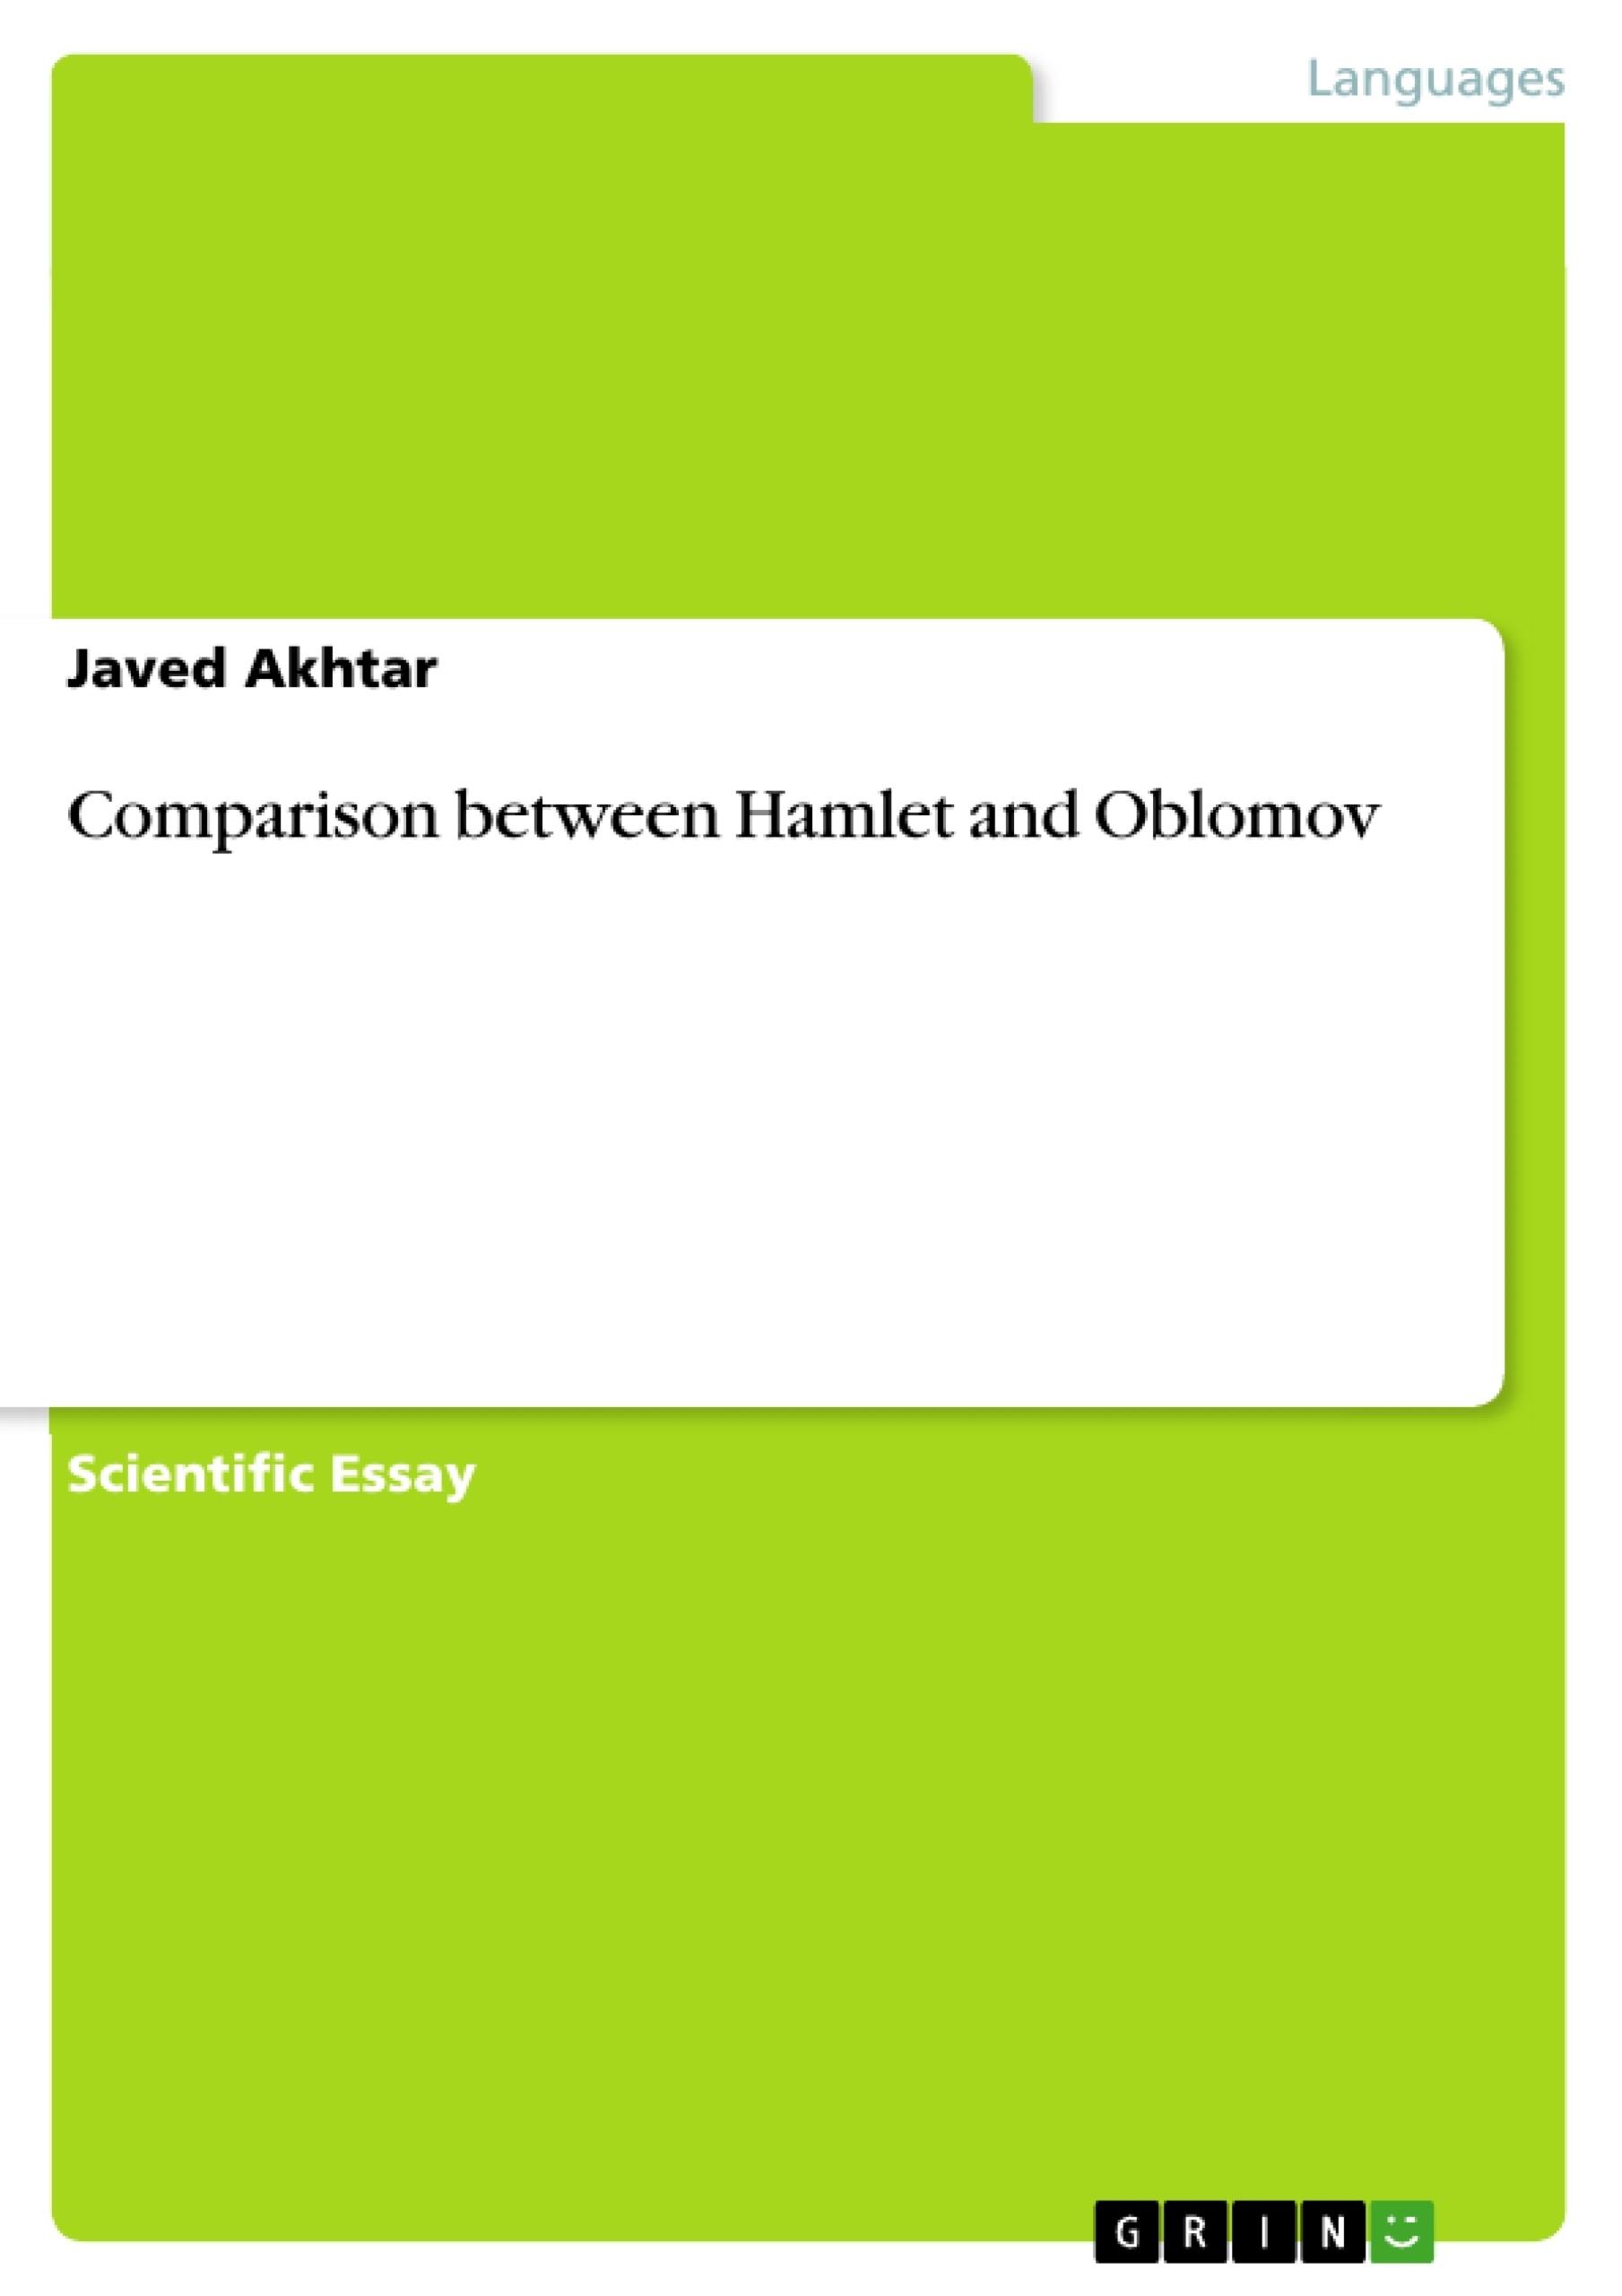 Title: Comparison between Hamlet and Oblomov